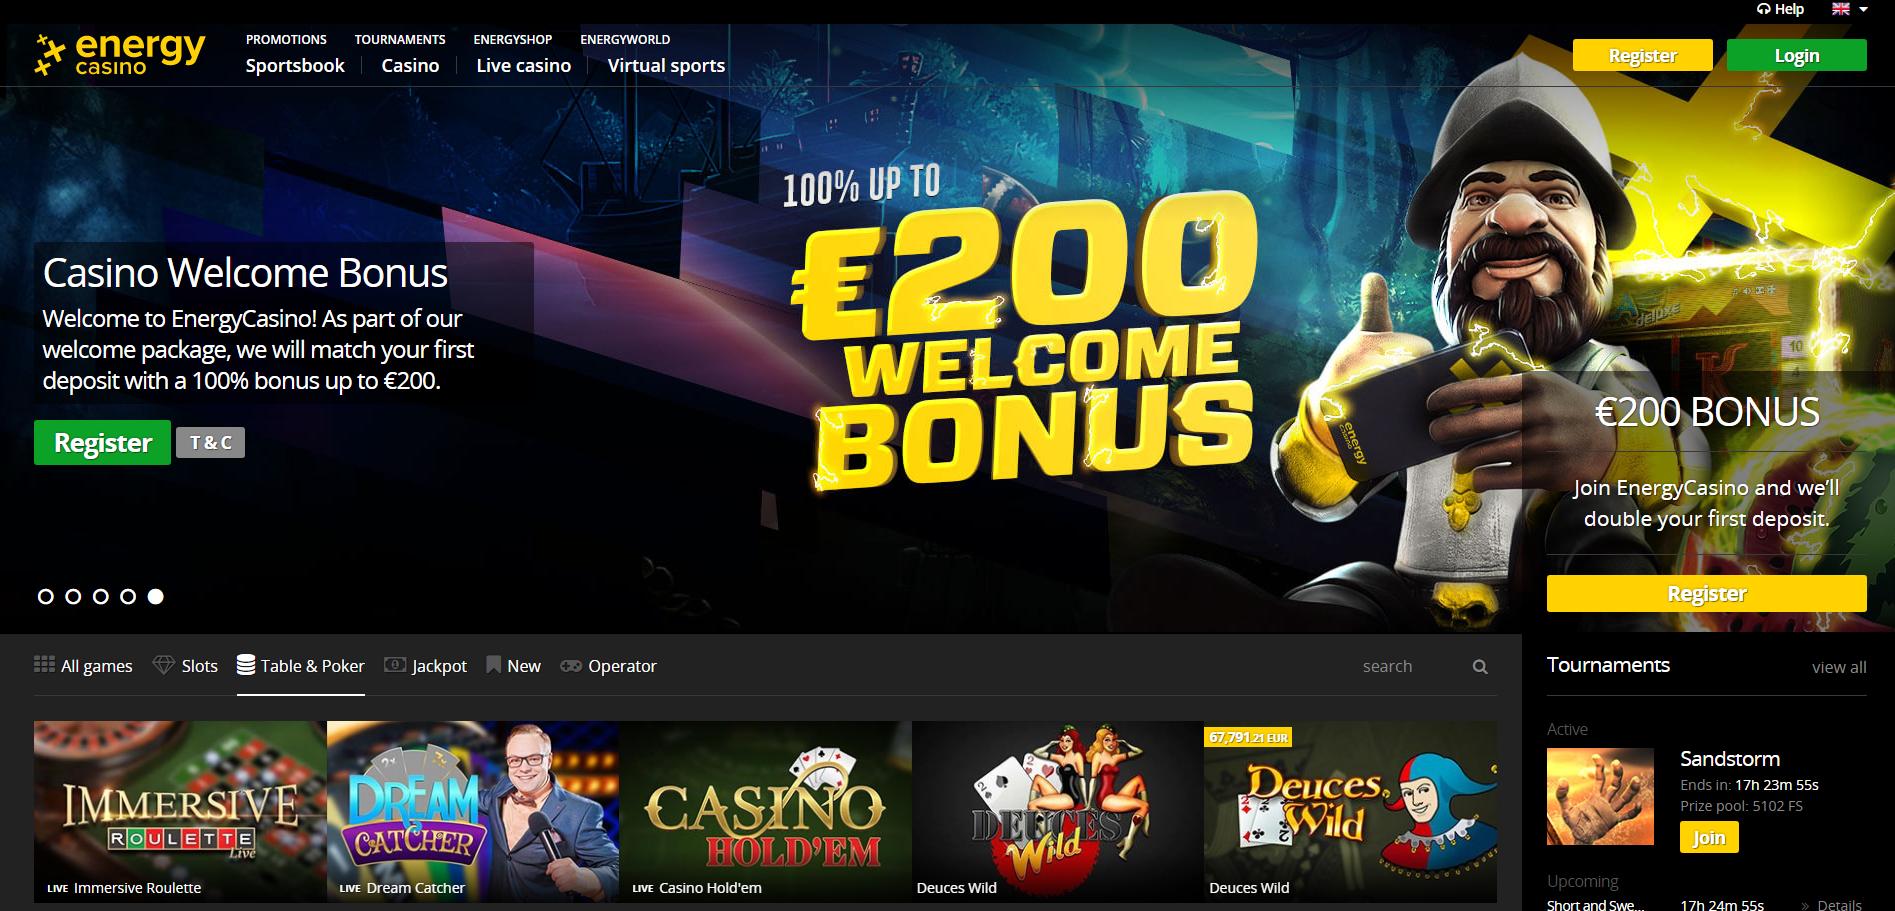 EnergyCasino-online-tables-poker